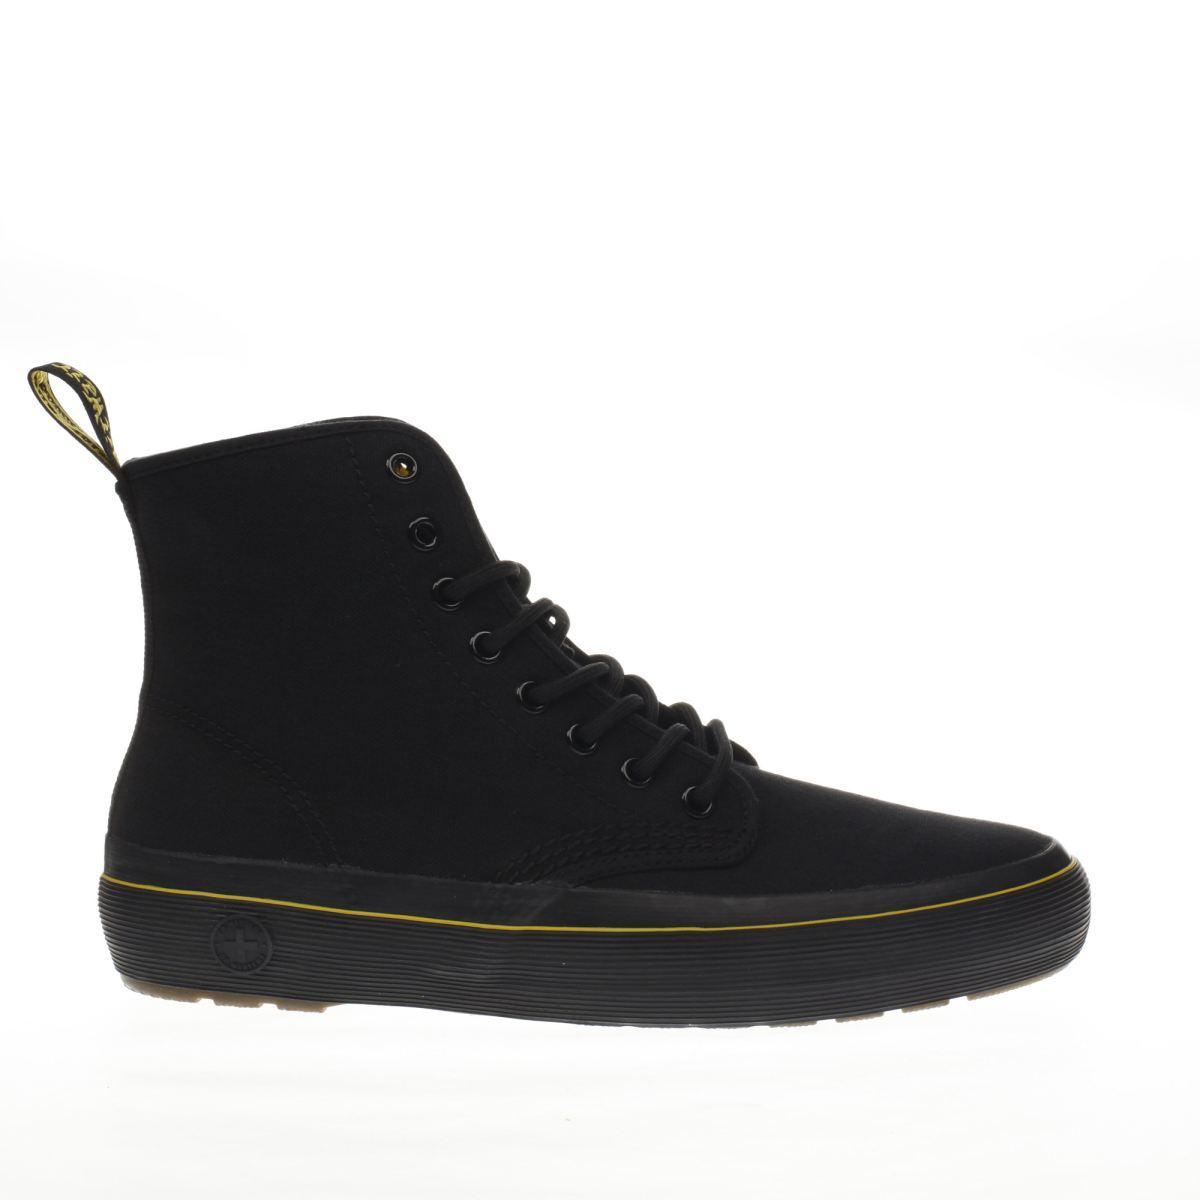 dr martens black monet 8 eye boots